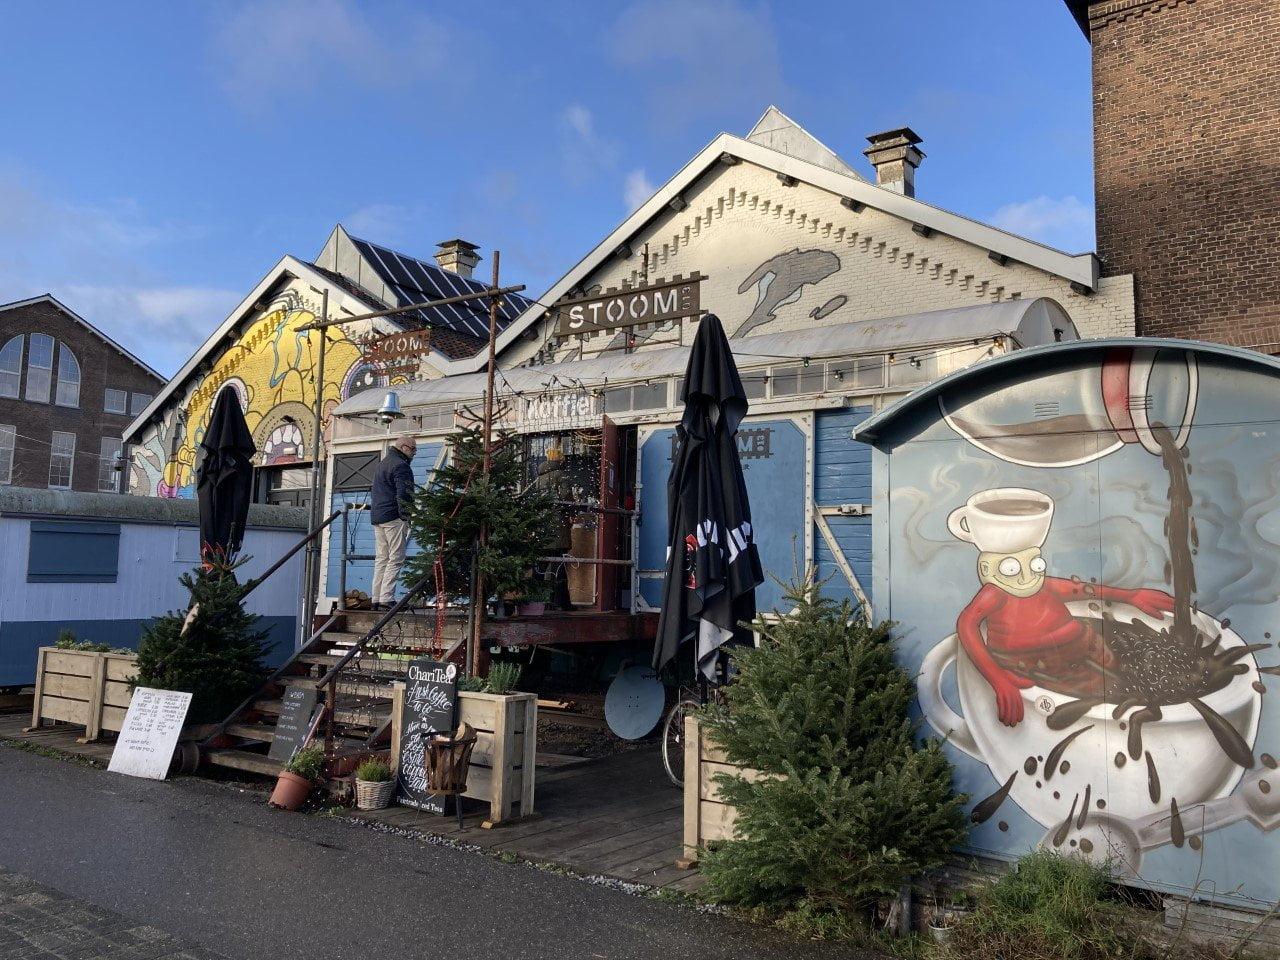 Tilburg: Coffee bar Stoom 013